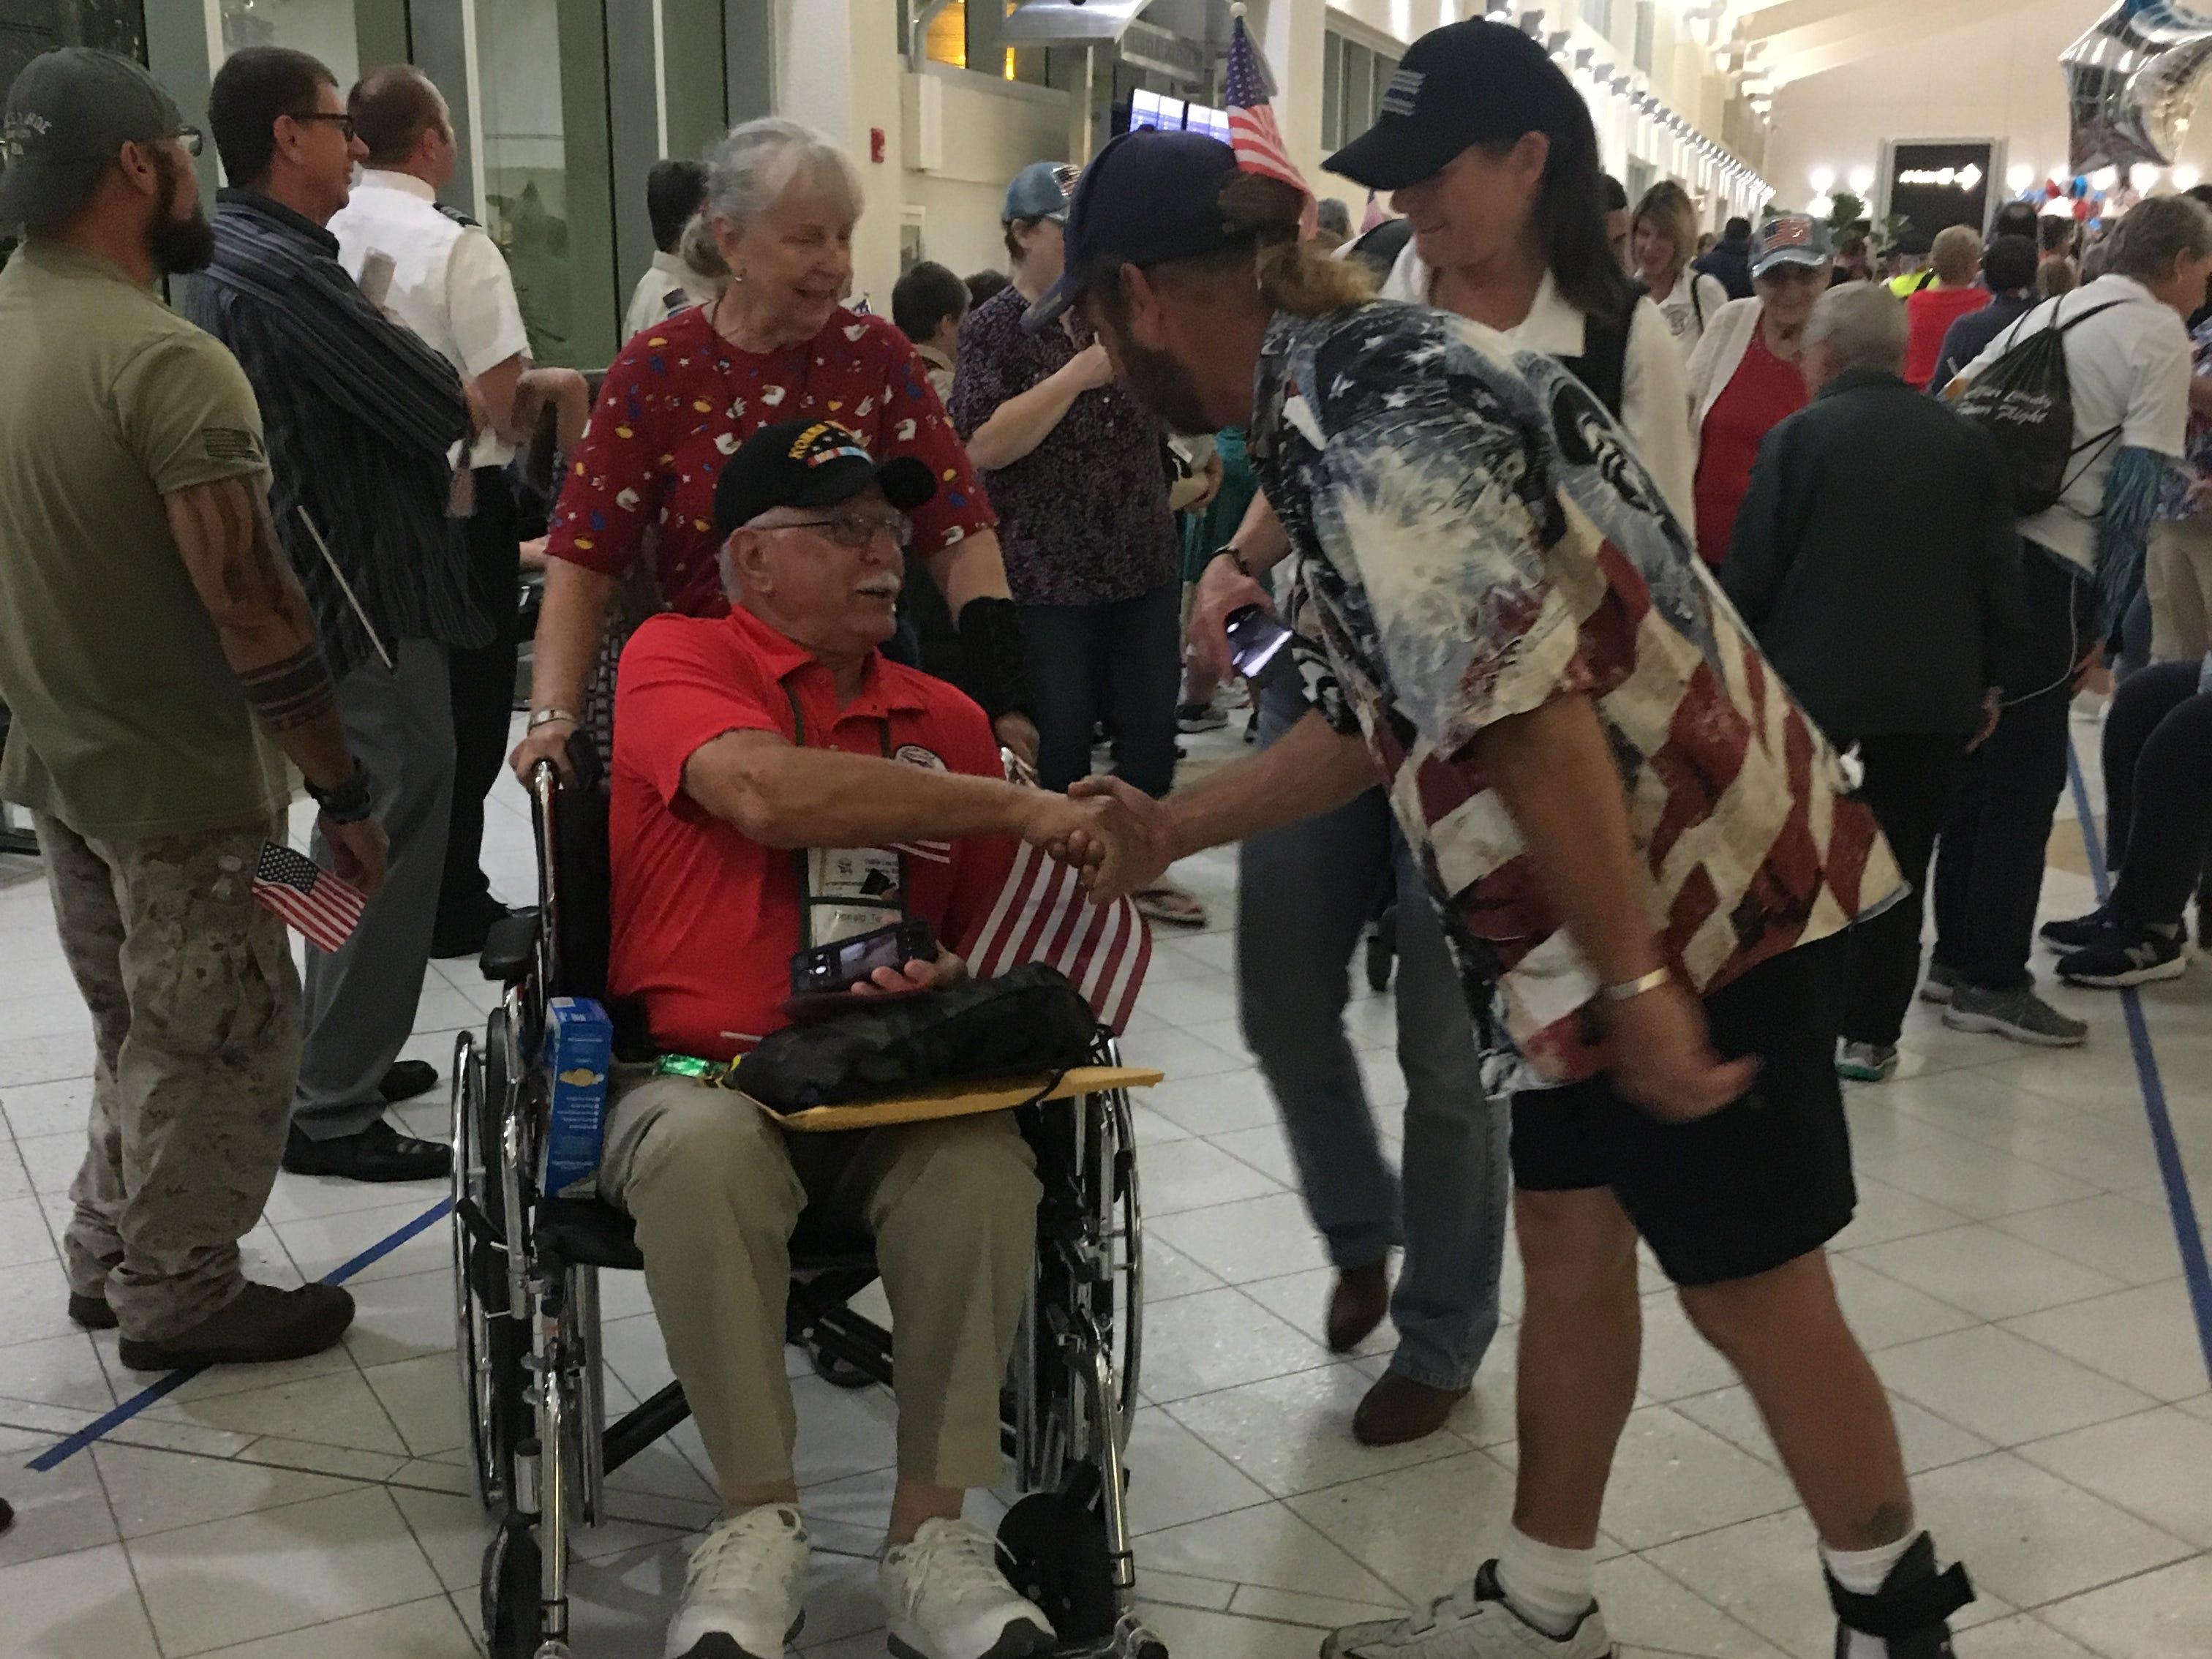 Korean War veteran Donald Turnes is greeted by fellow veterans at Southwest Florida International Airport Saturday, May 4, 2019.